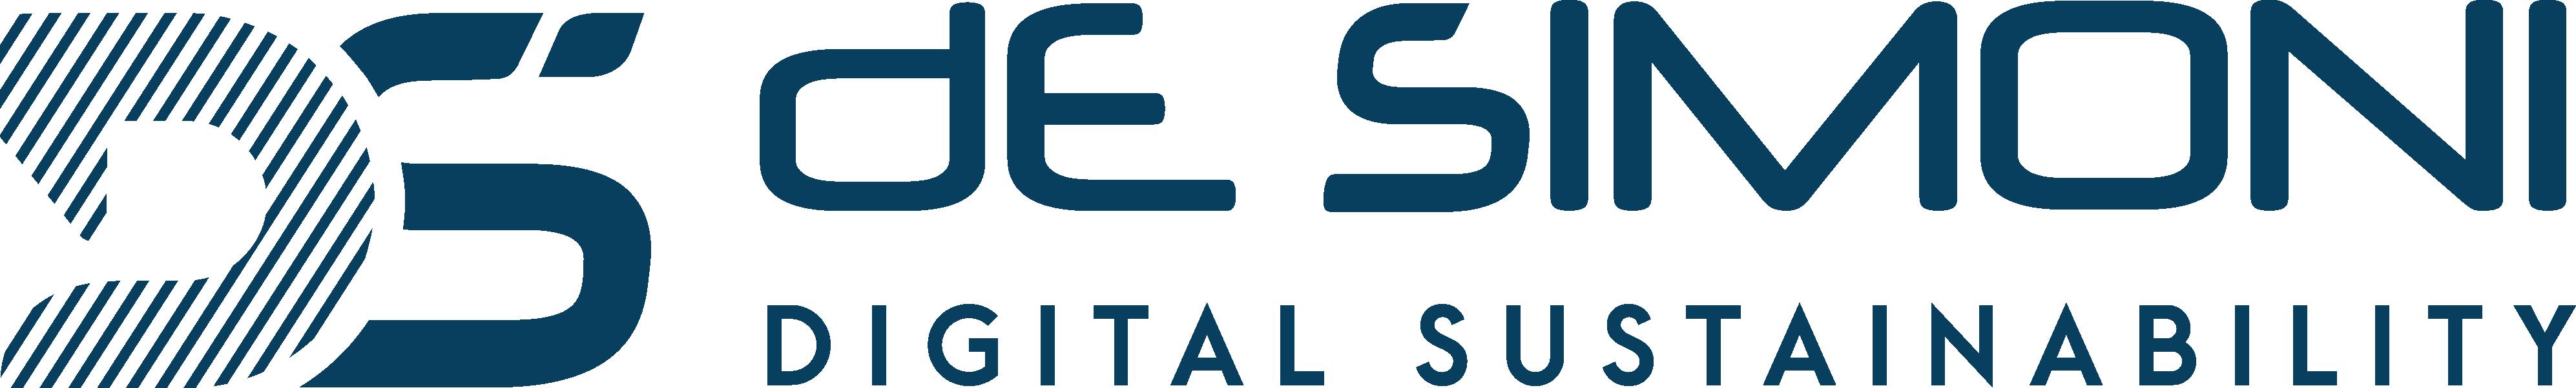 logo_Risorsa 5